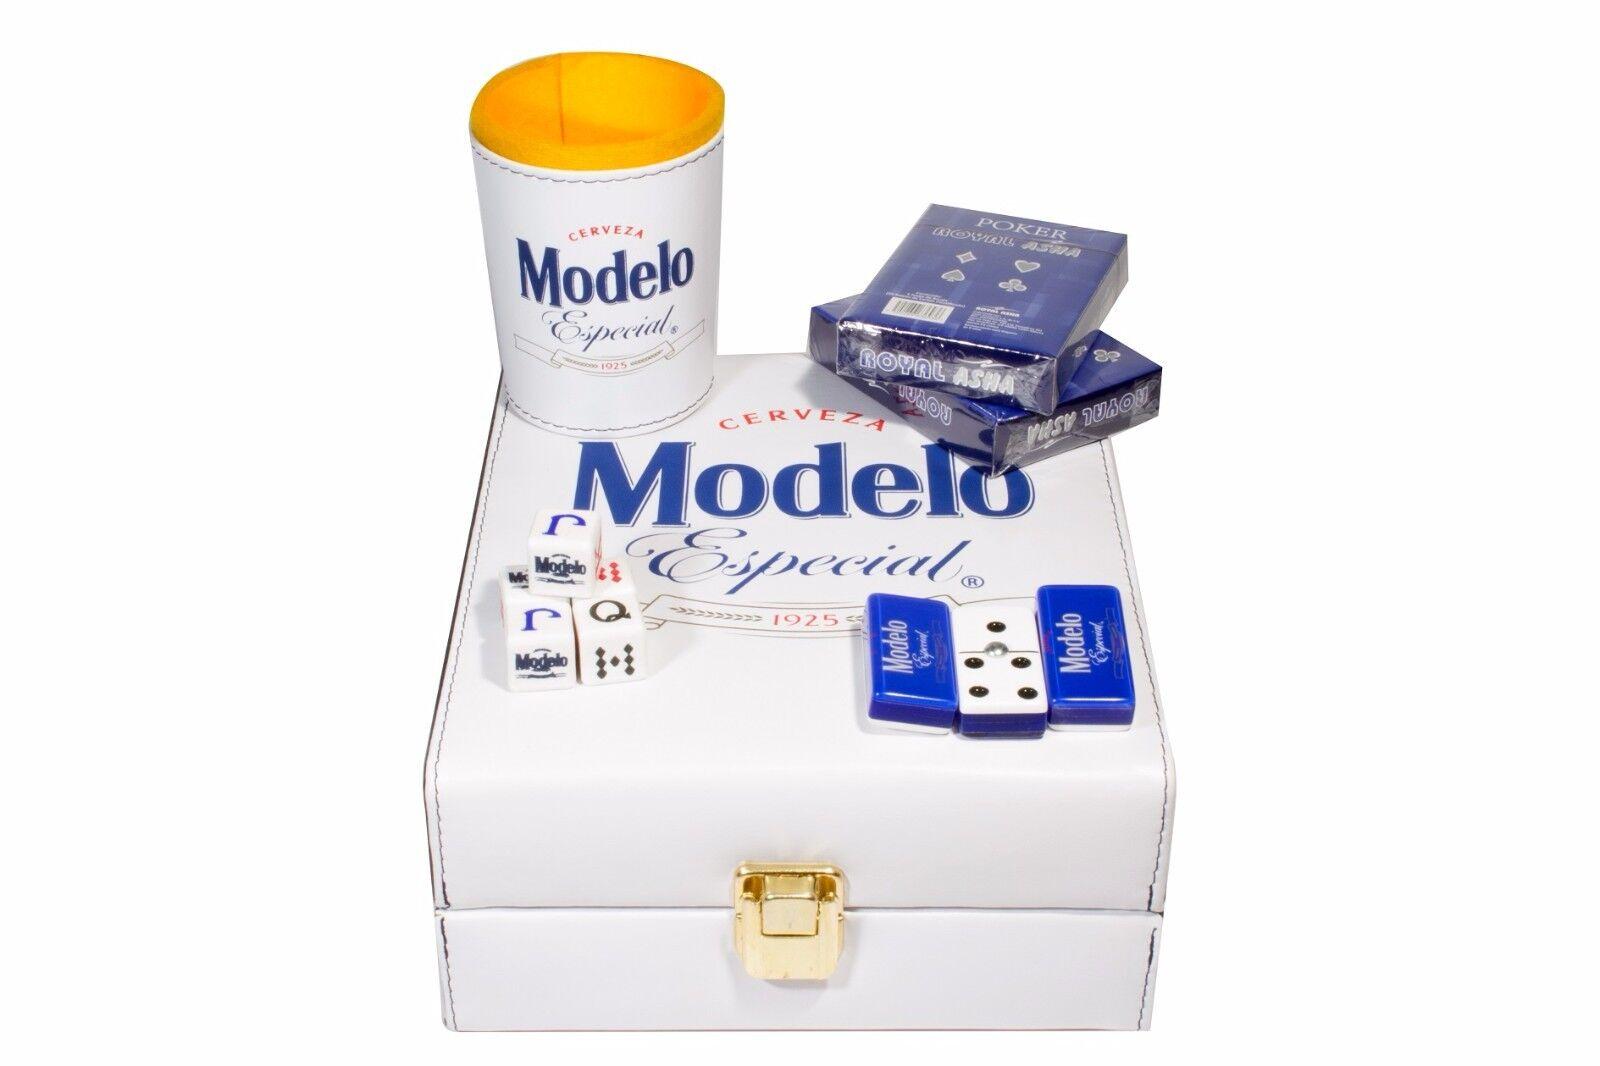 Modelo Beer Deluxe Set 3 Games  Domino, Dice Cup, 2 Poker Cards